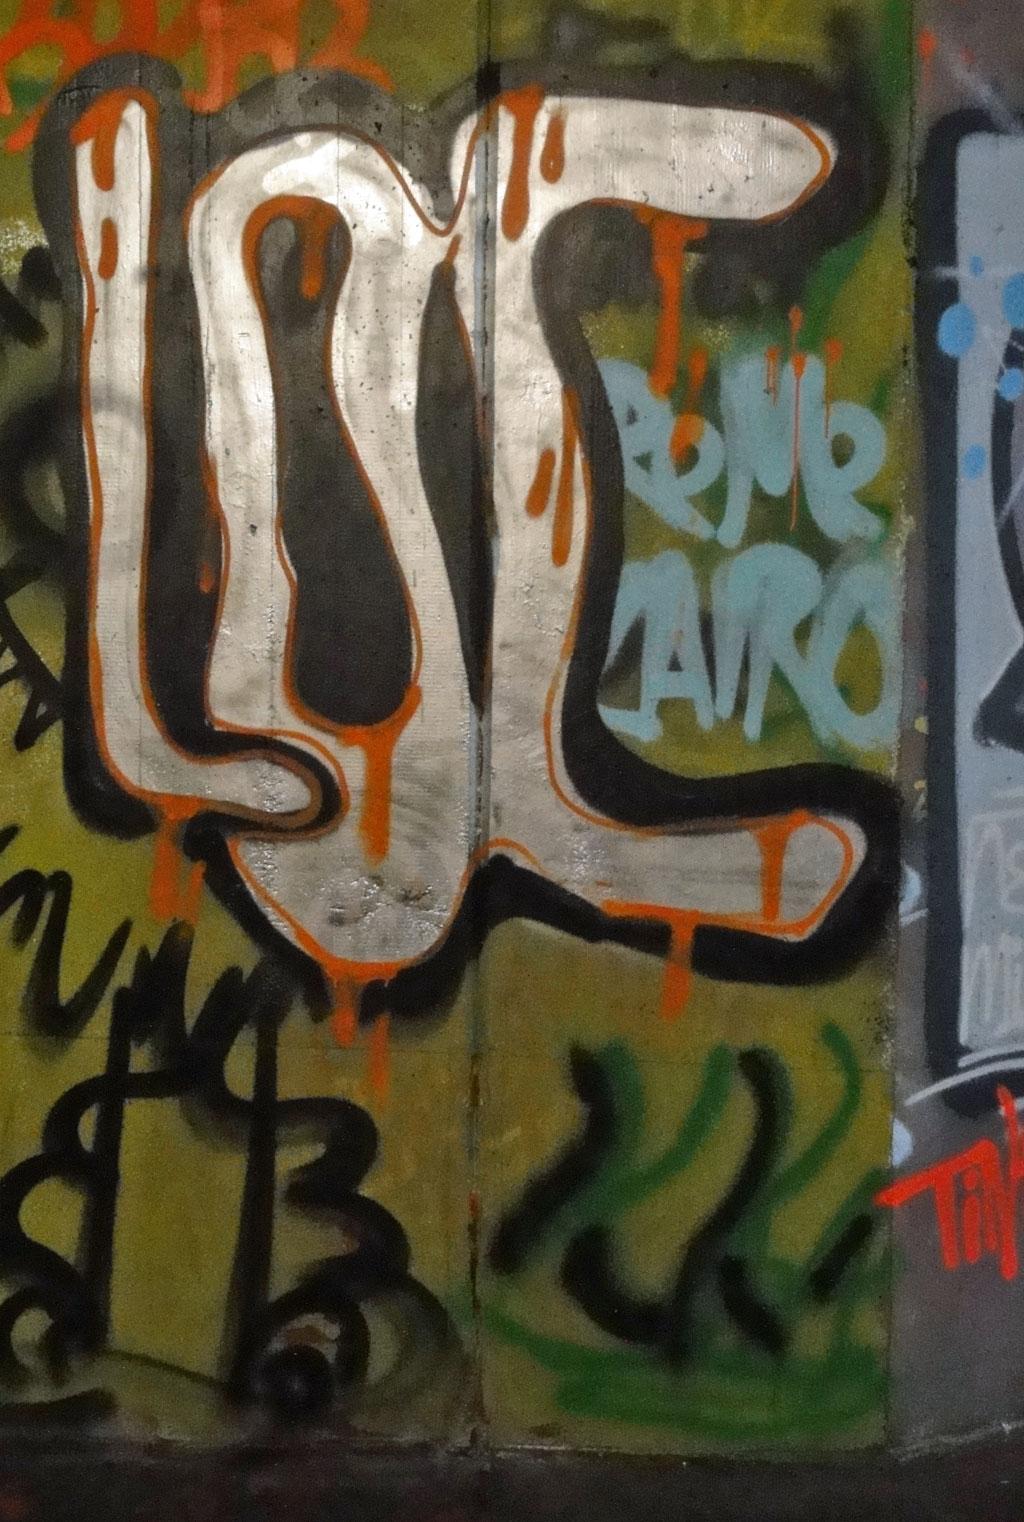 loc-hanauer-landstrasse-graffiti-in-frankfurt